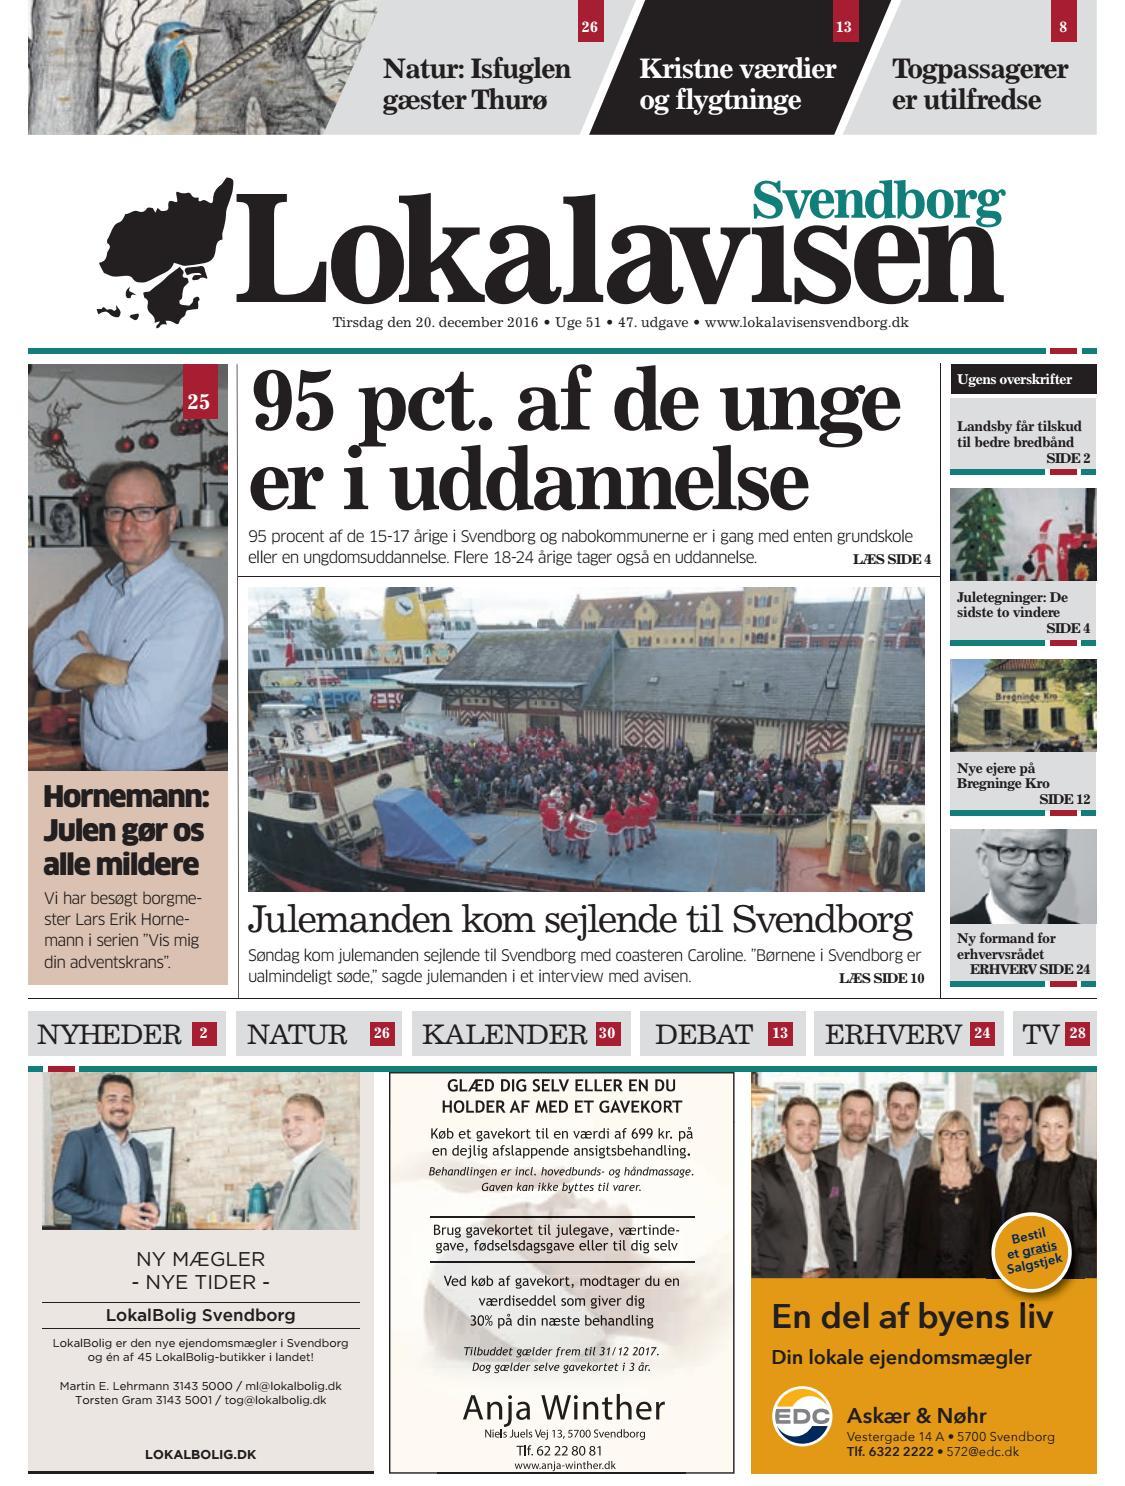 bordel dk wellness svendborg